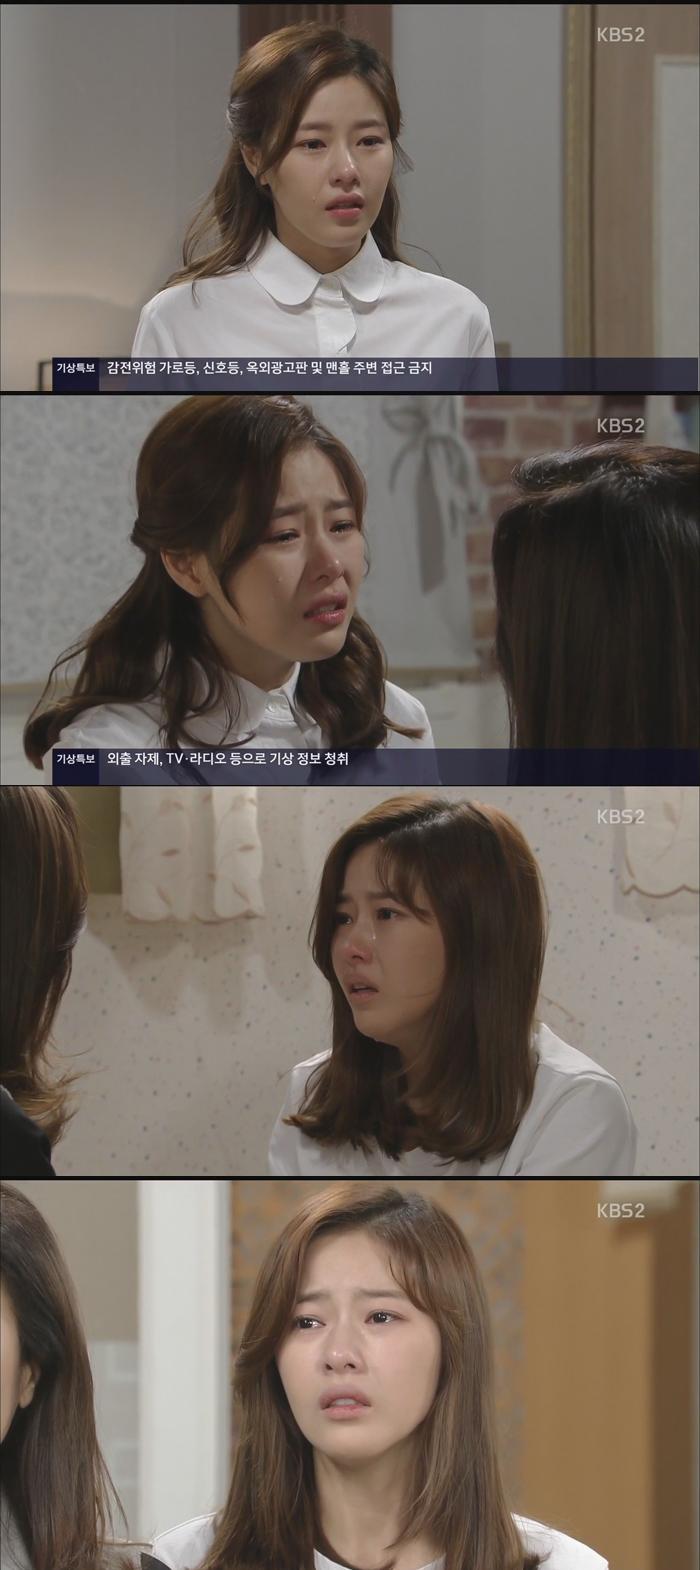 [FN ENT] 180518_박하나_인형의집_충격의 분노 연기로 시청자들의 눈물샘 자극